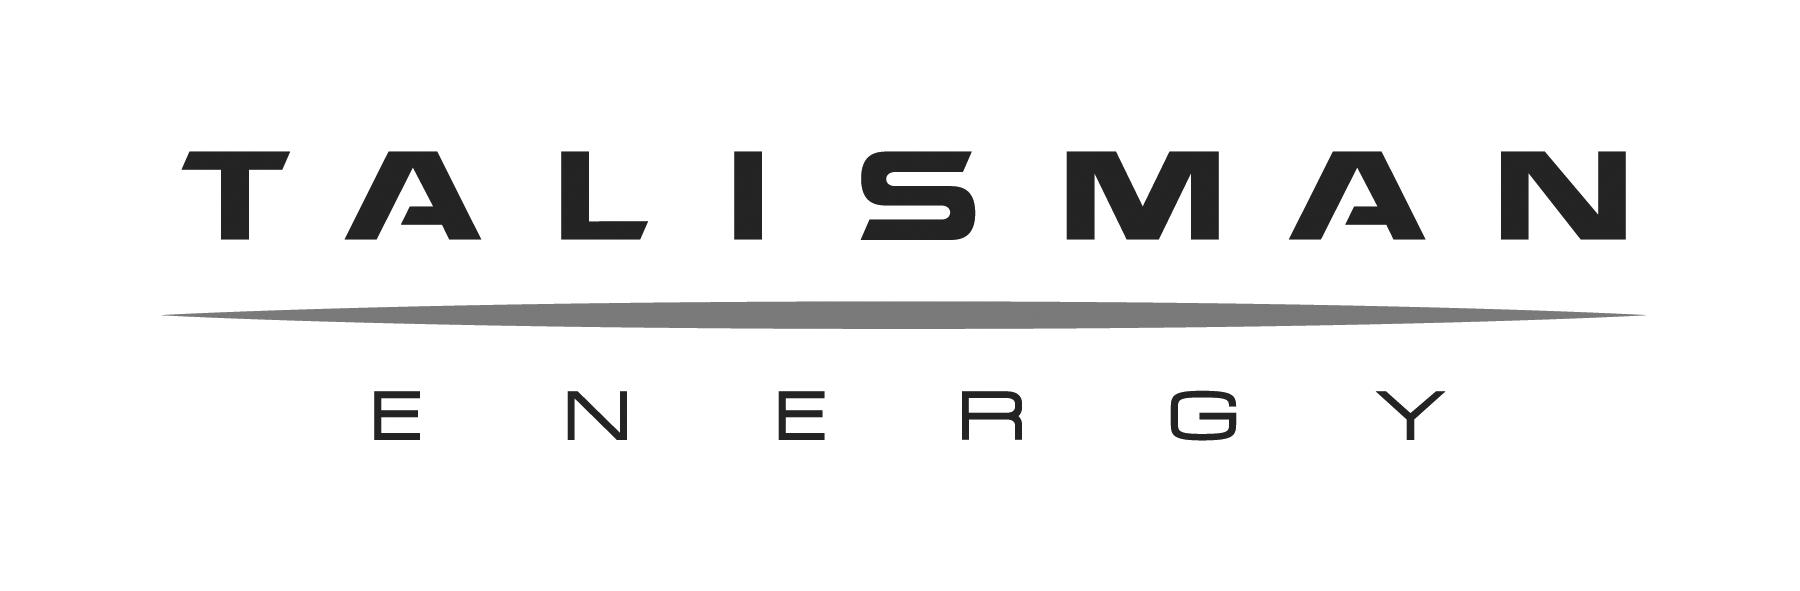 Talisman Energy.png